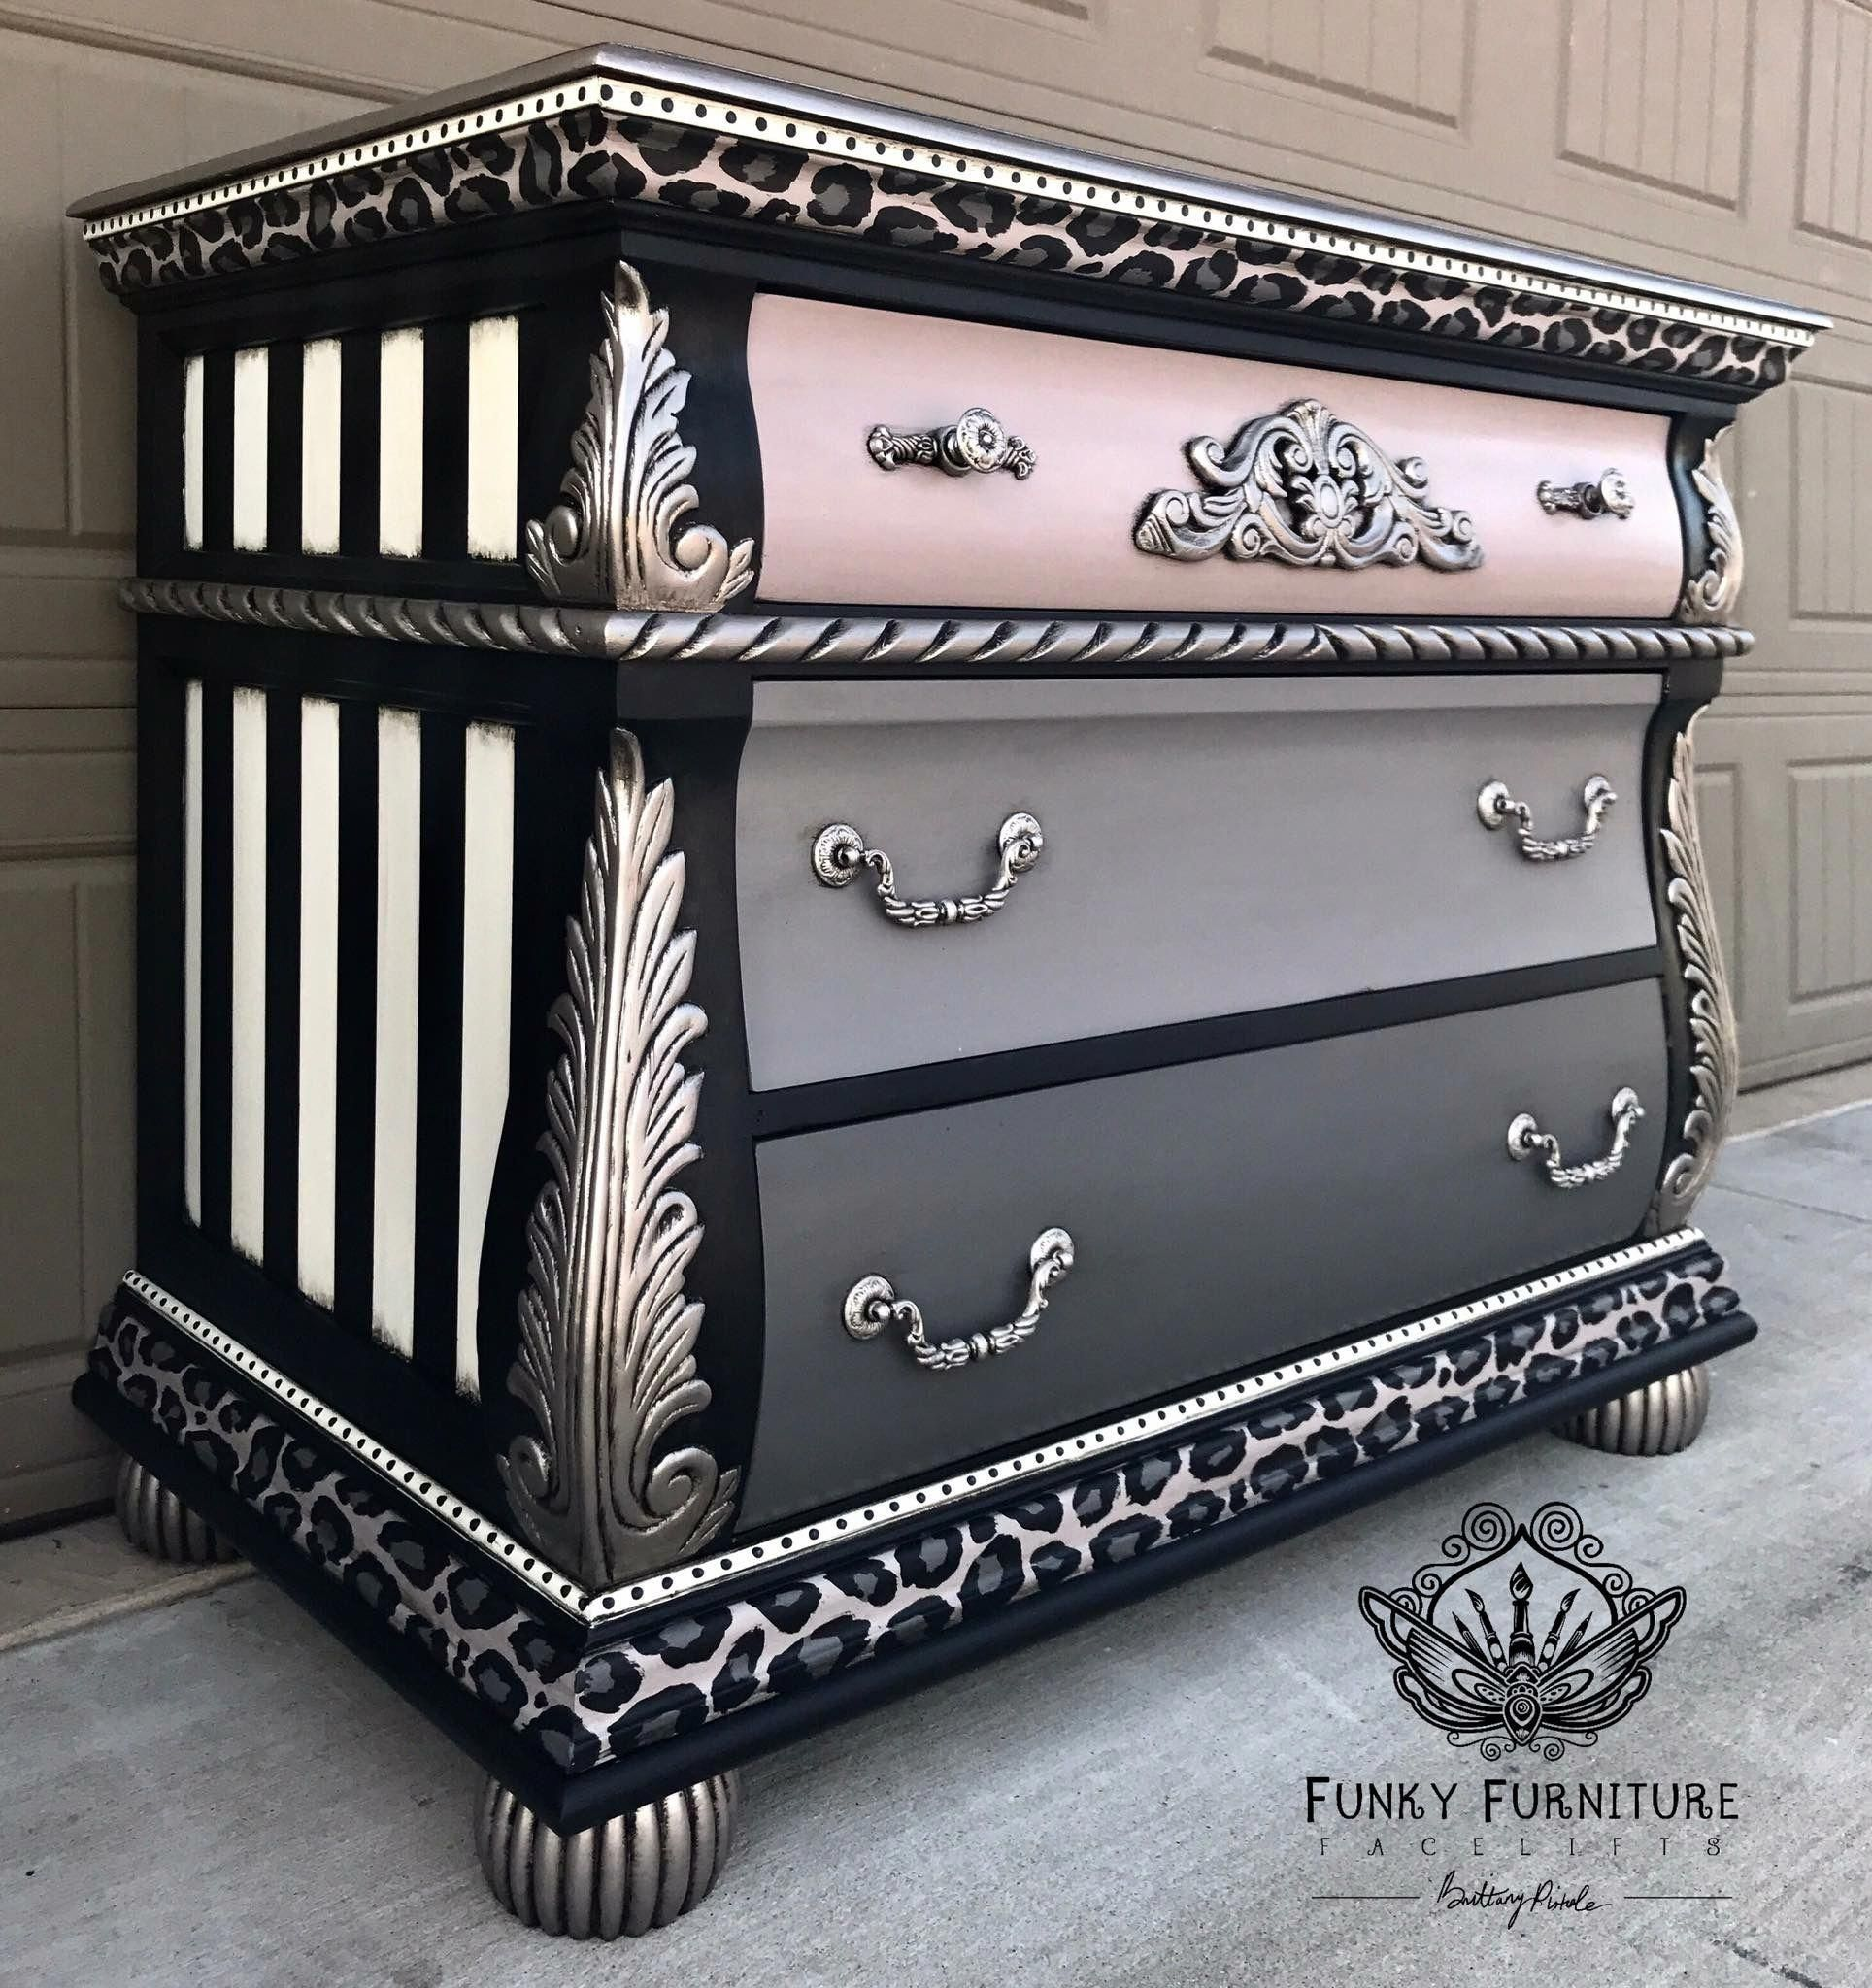 Leopard And Metallic Finish Furniture #Paintedfurniture